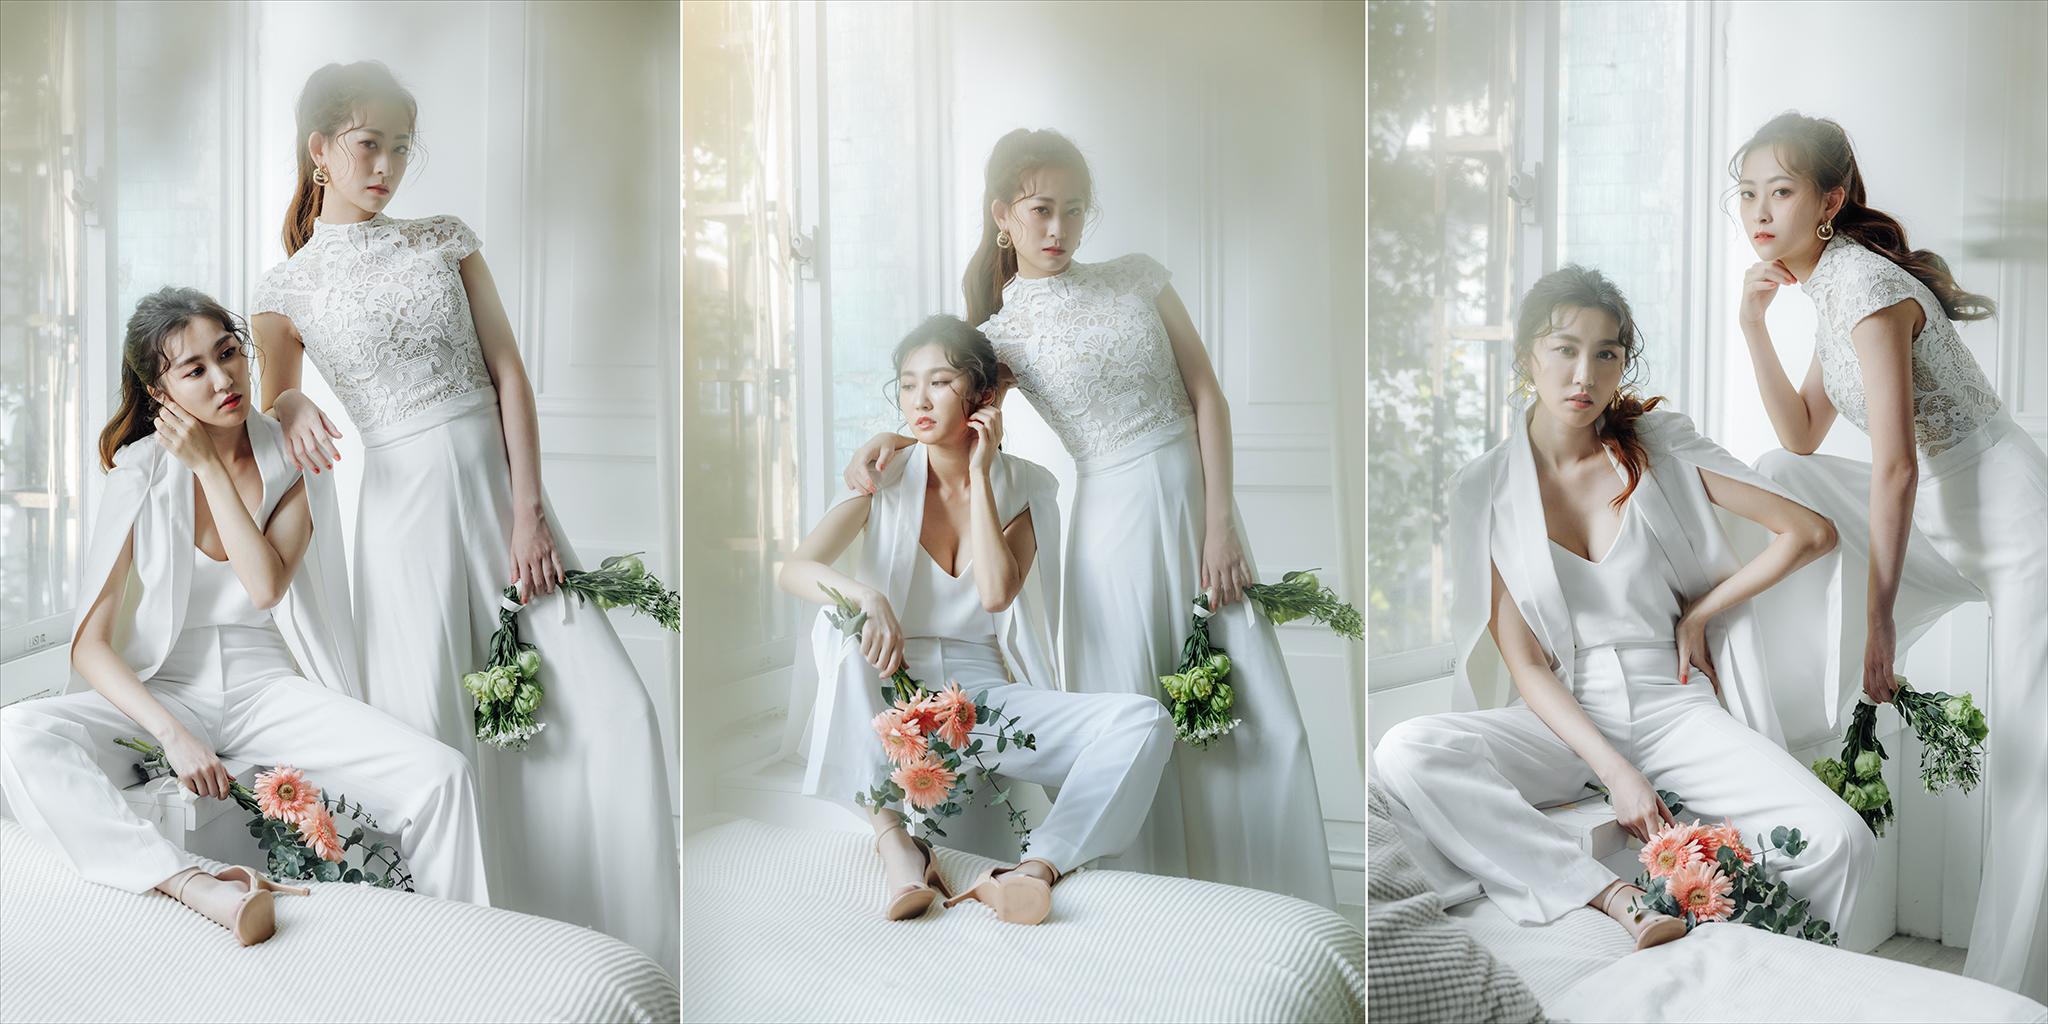 49928735828 4ddb0d6383 o - 【閨蜜婚紗】+Jessy & Tiffany+